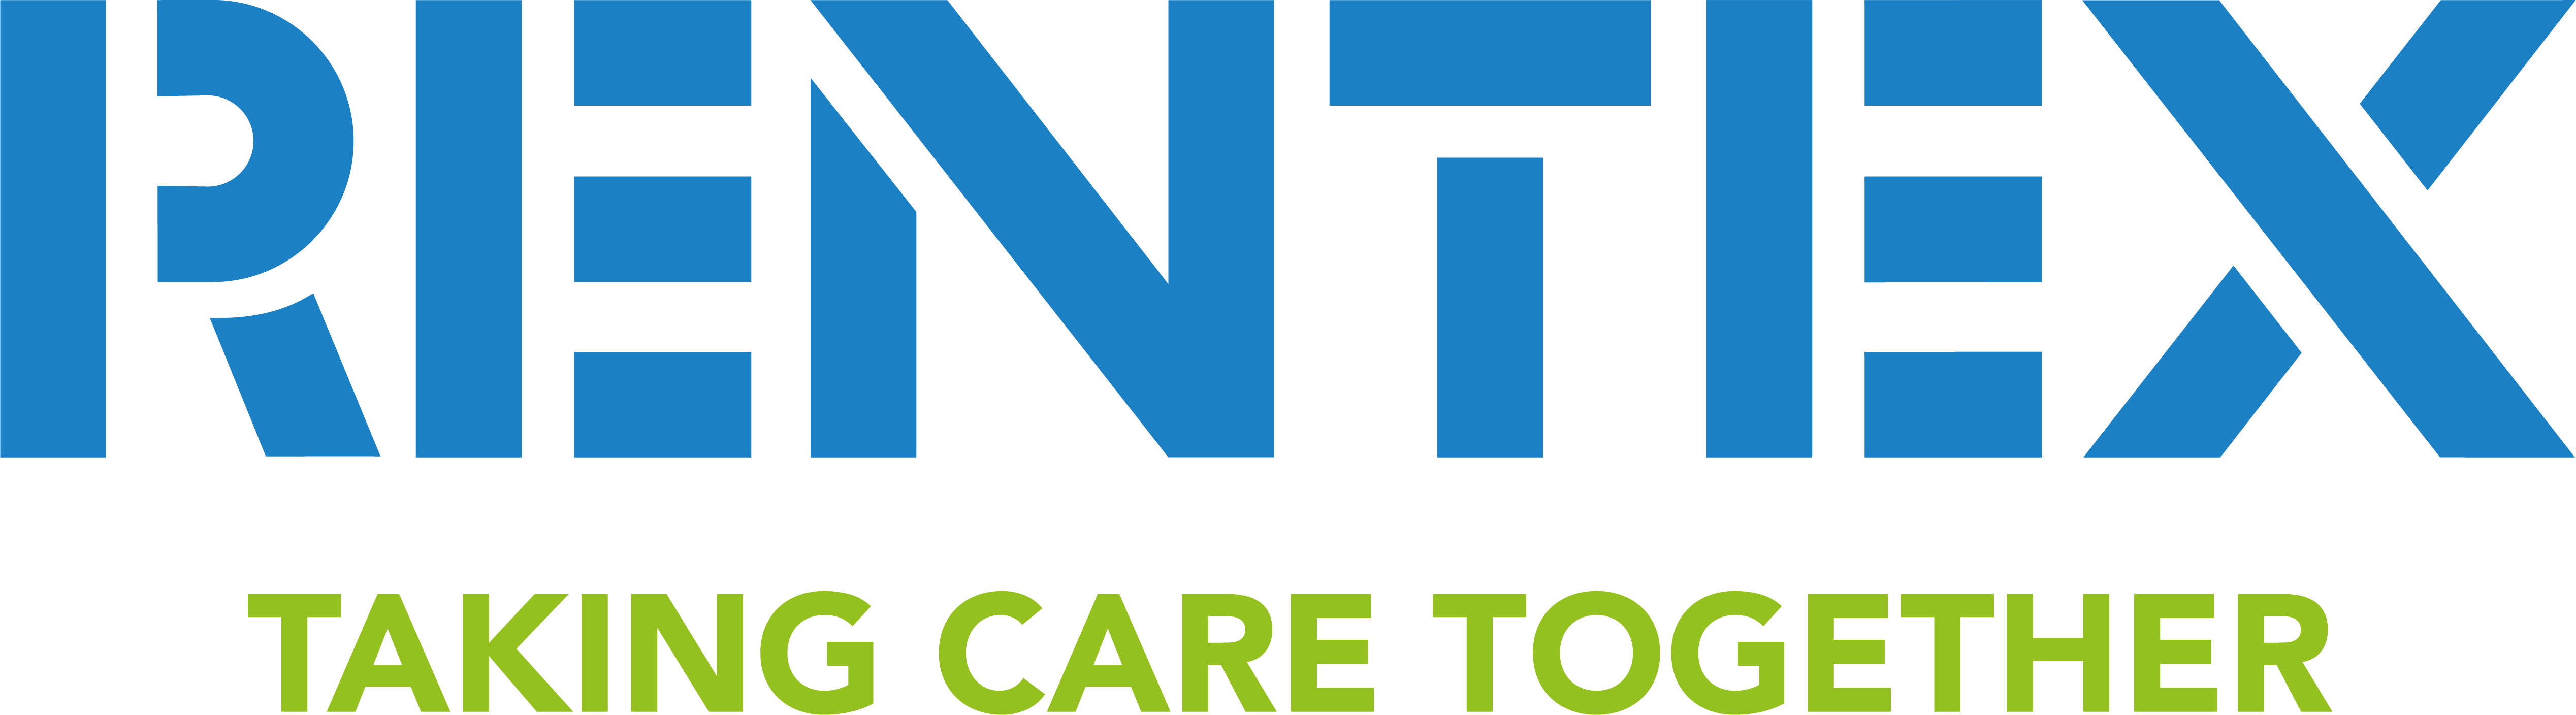 Logo Rentex 2020 Rgb